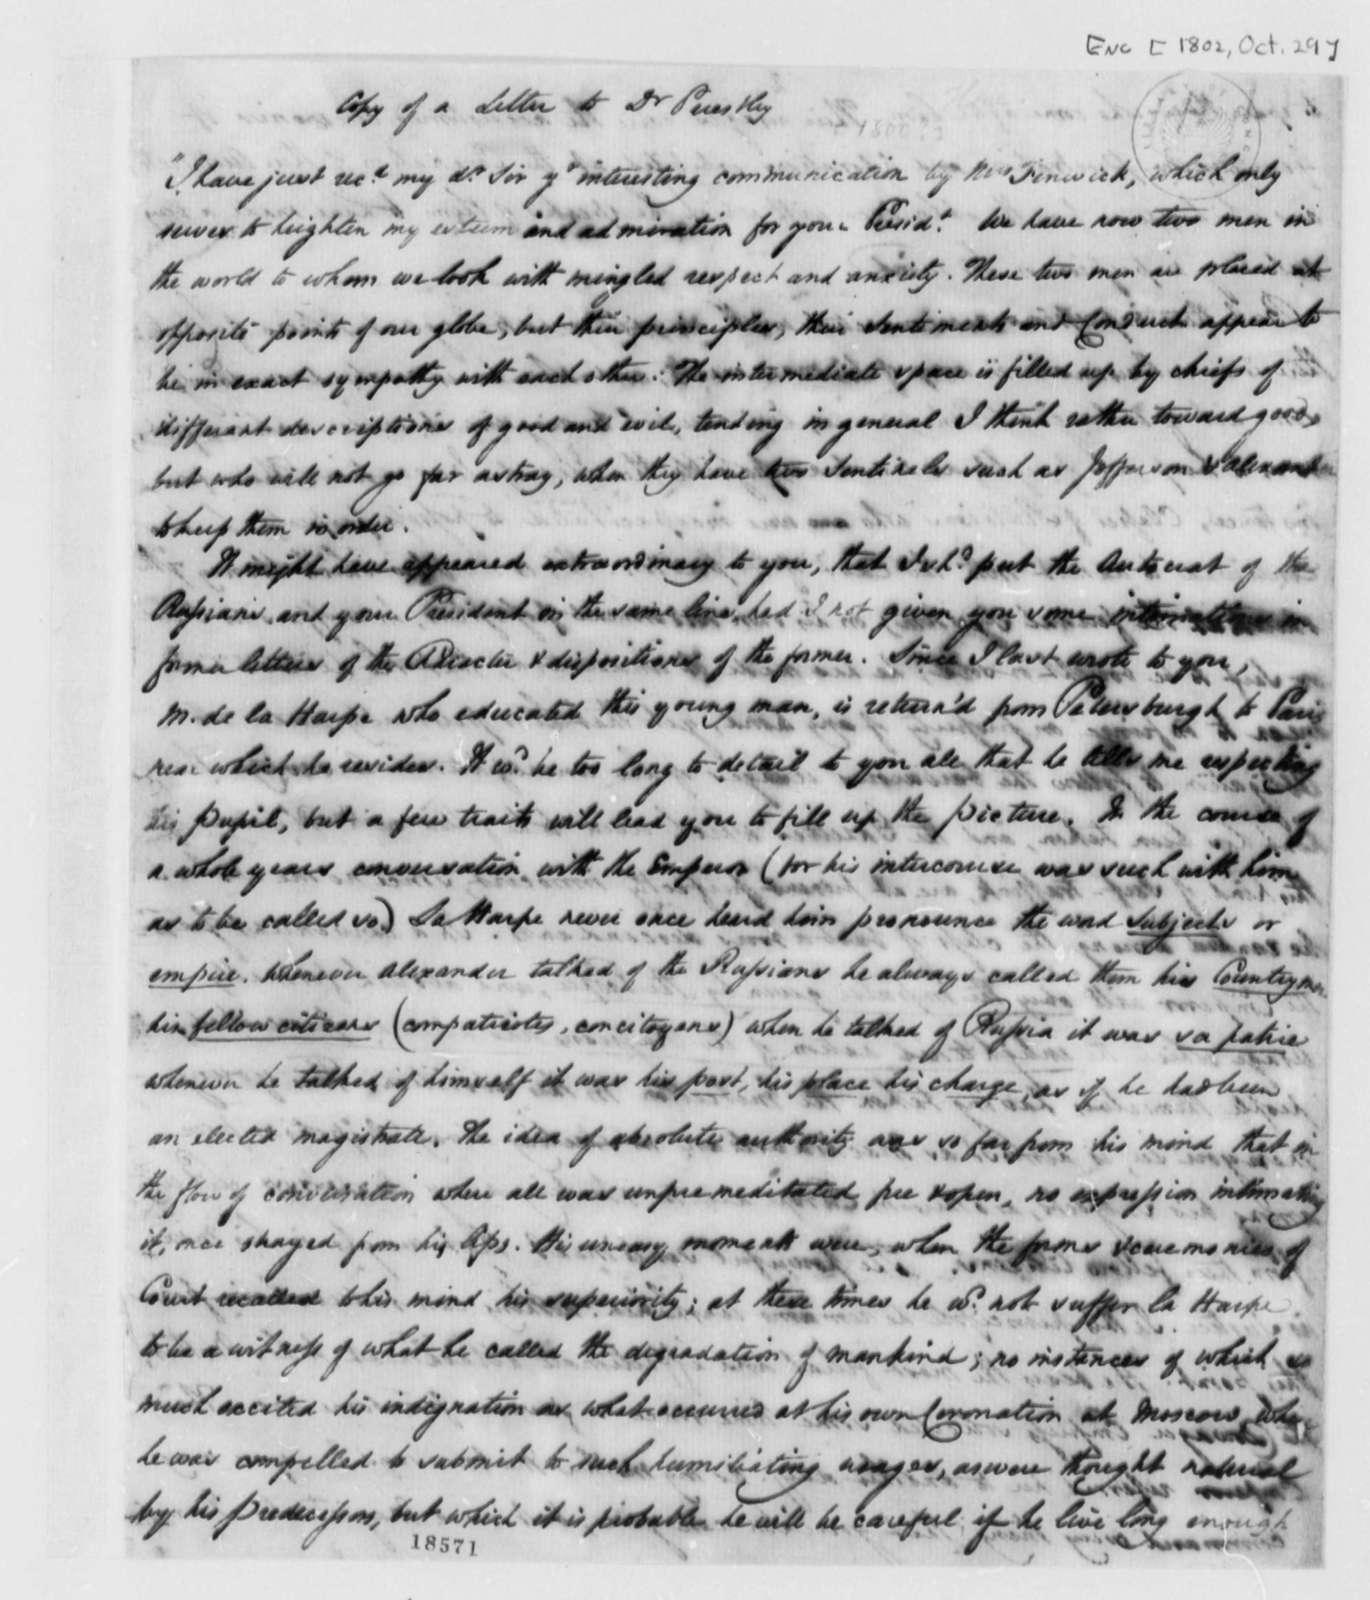 Howe to Joseph Priestley, October 29, 1802